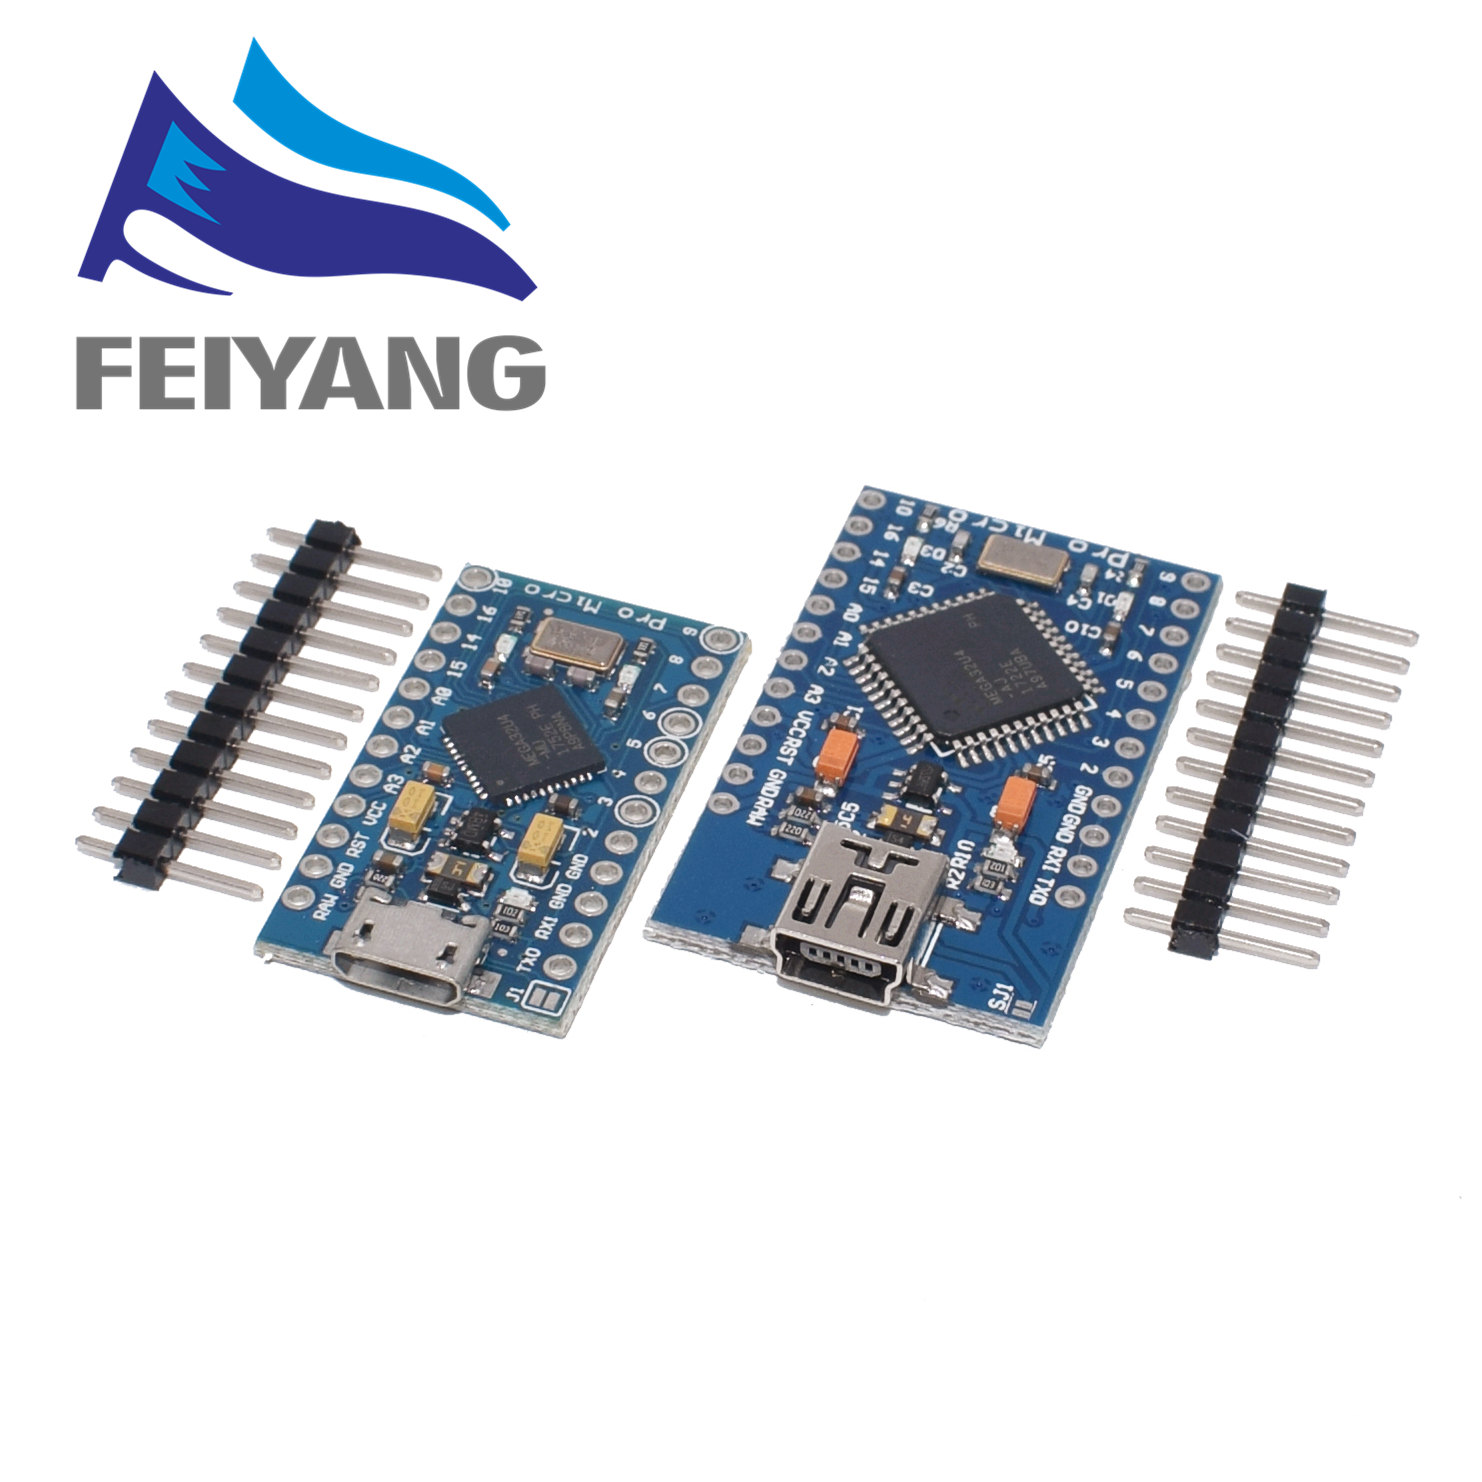 Module de carte PRO MICRO/MINI USB 5V 16MHz pour contrôleur Arduino/Leonardo ATMEGA32U4-AU/MU Pro-Micro remplacer Pro Mini